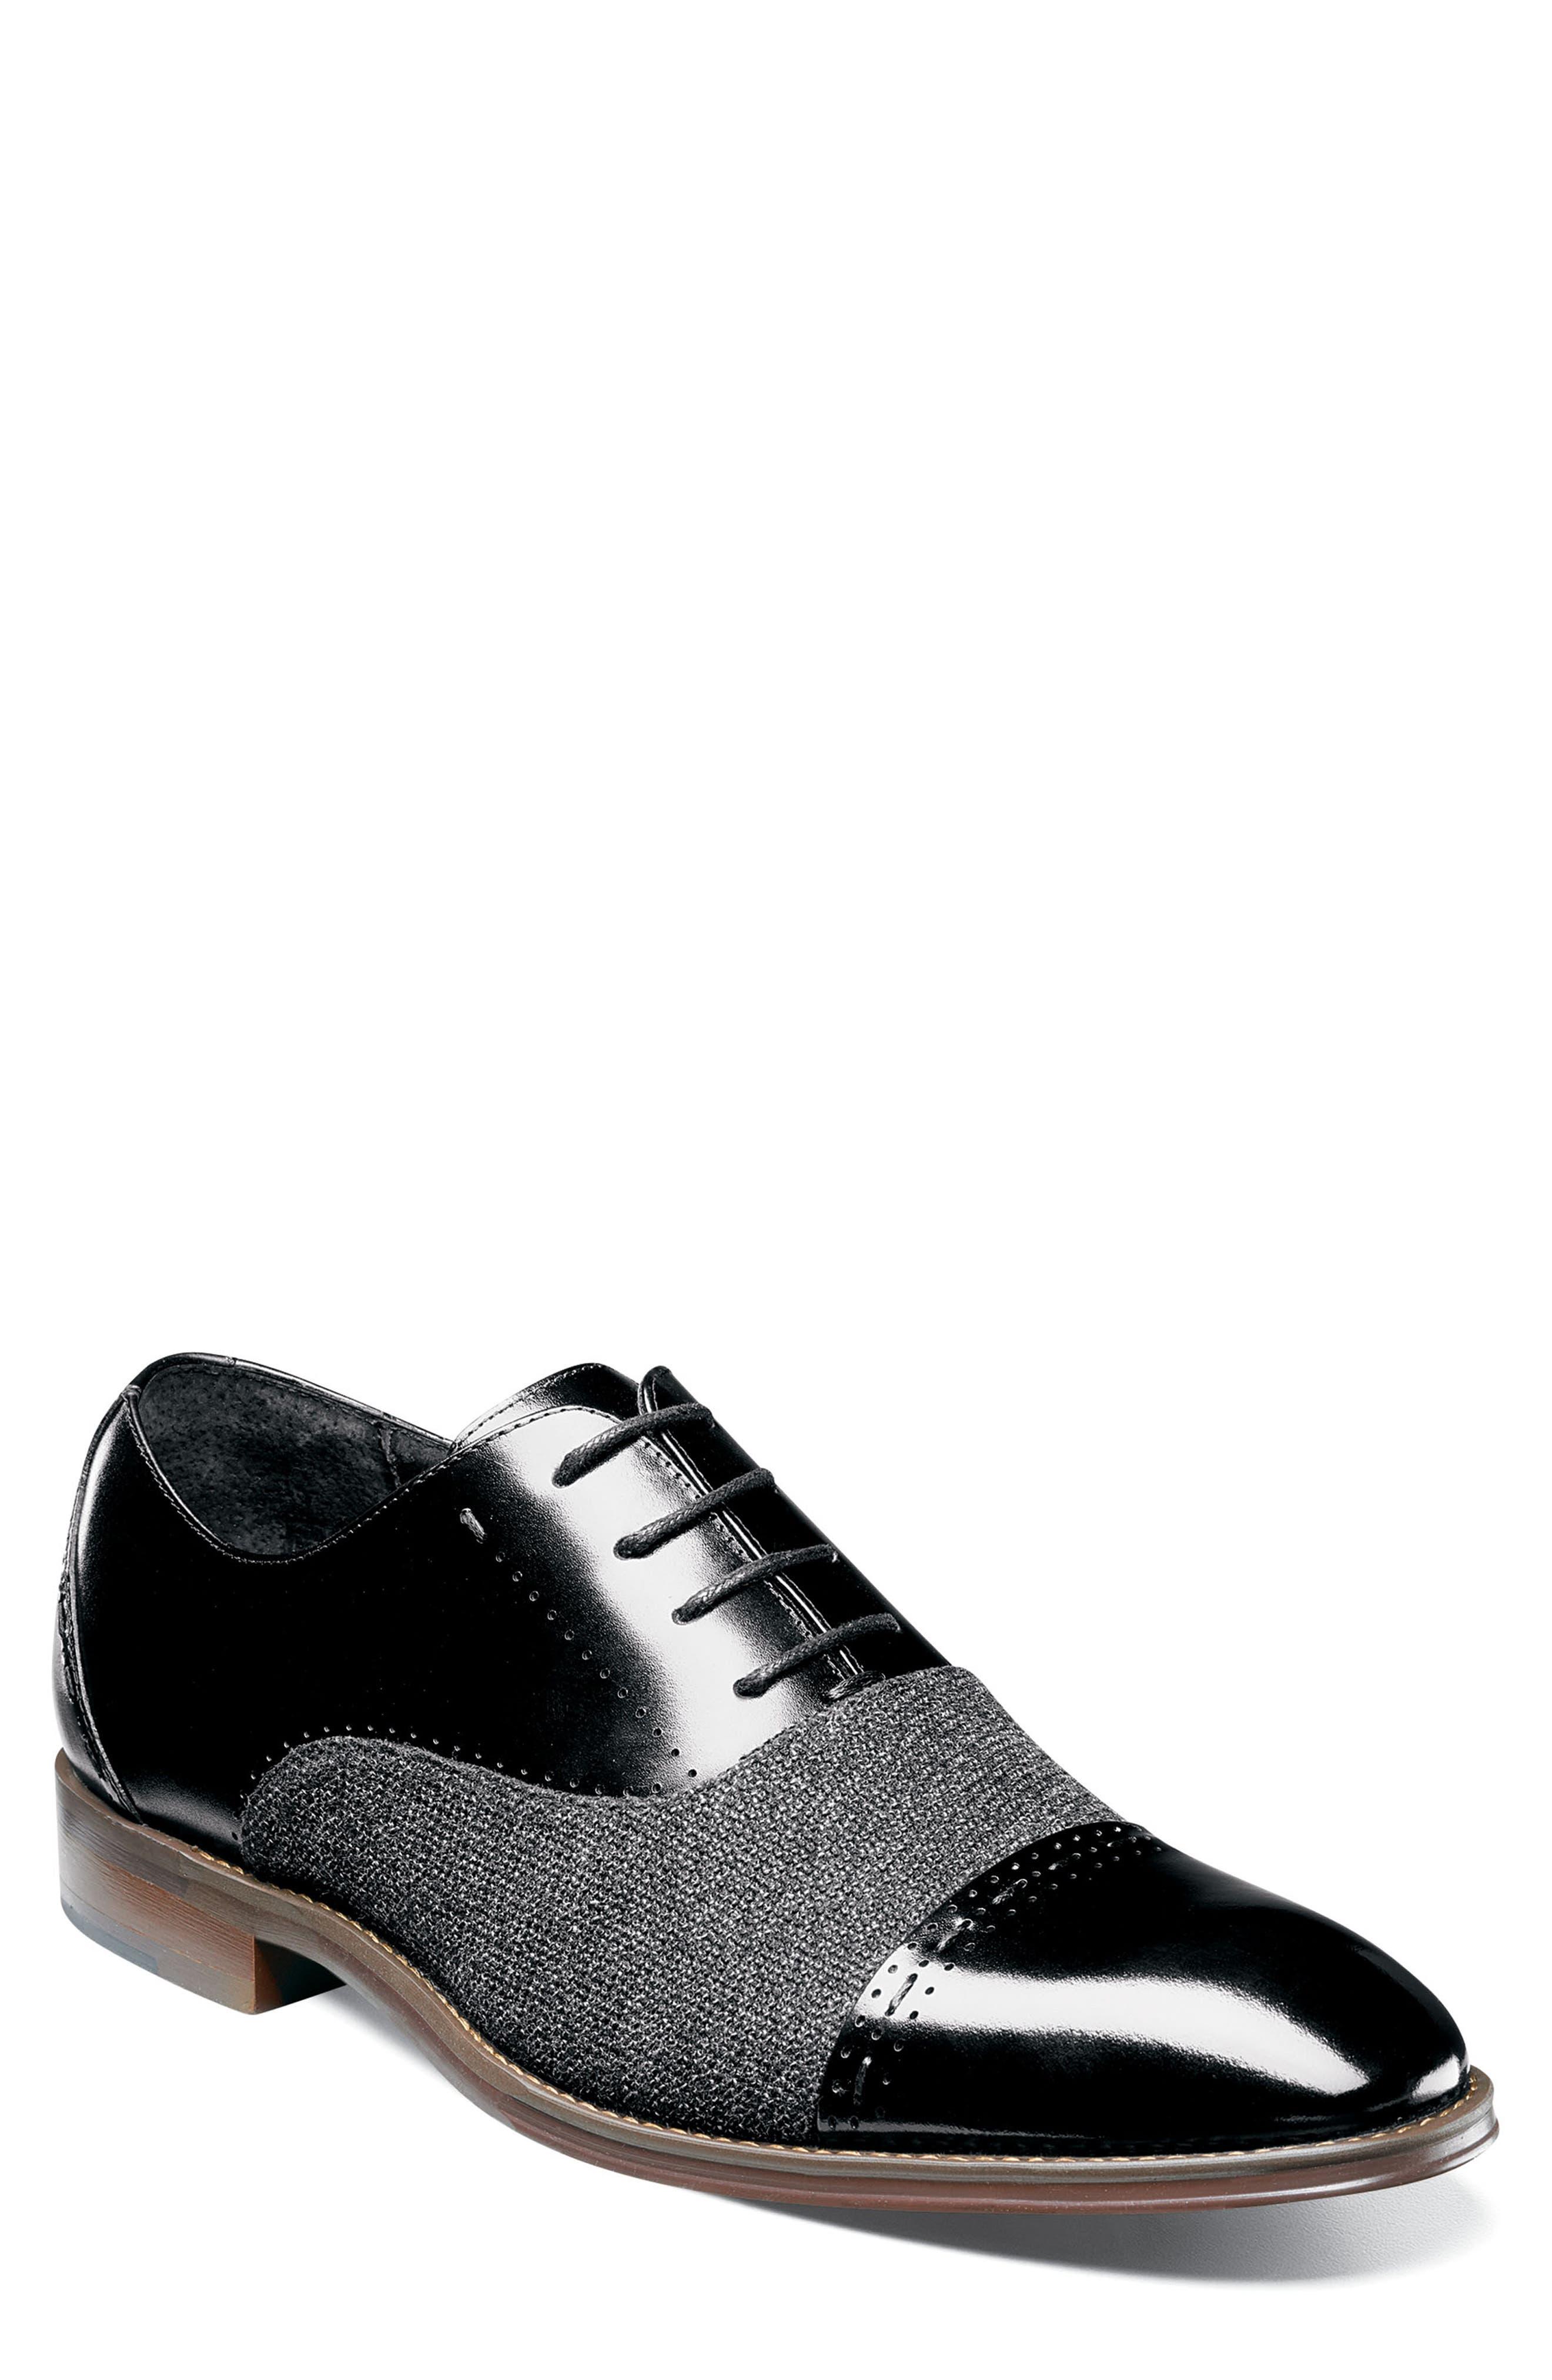 Barrington Cap Toe Oxford,                         Main,                         color, BLACK LEATHER/ FABRIC